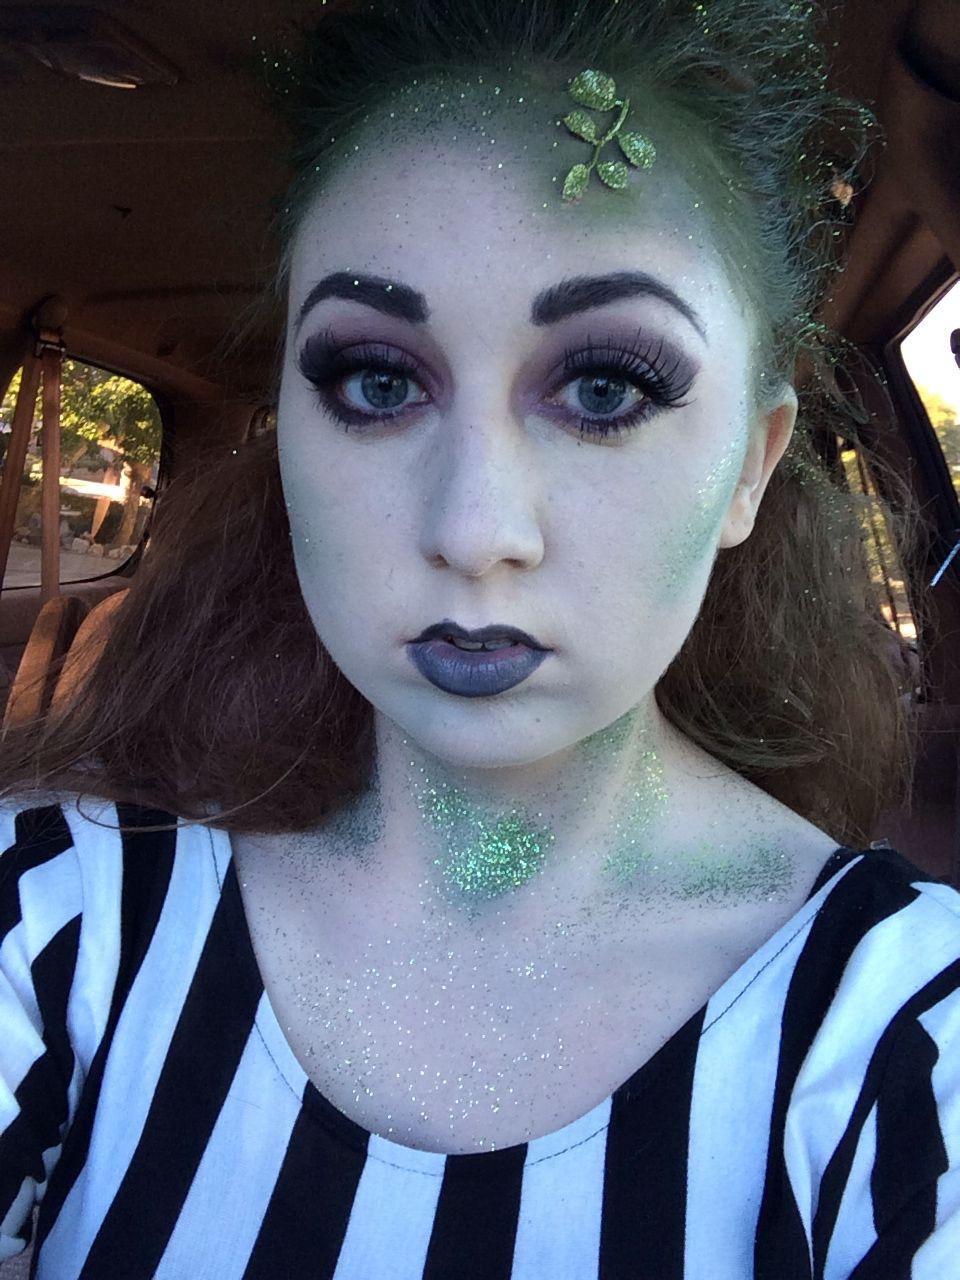 beetlejuice halloween makeup. beetle juice halloween costume female